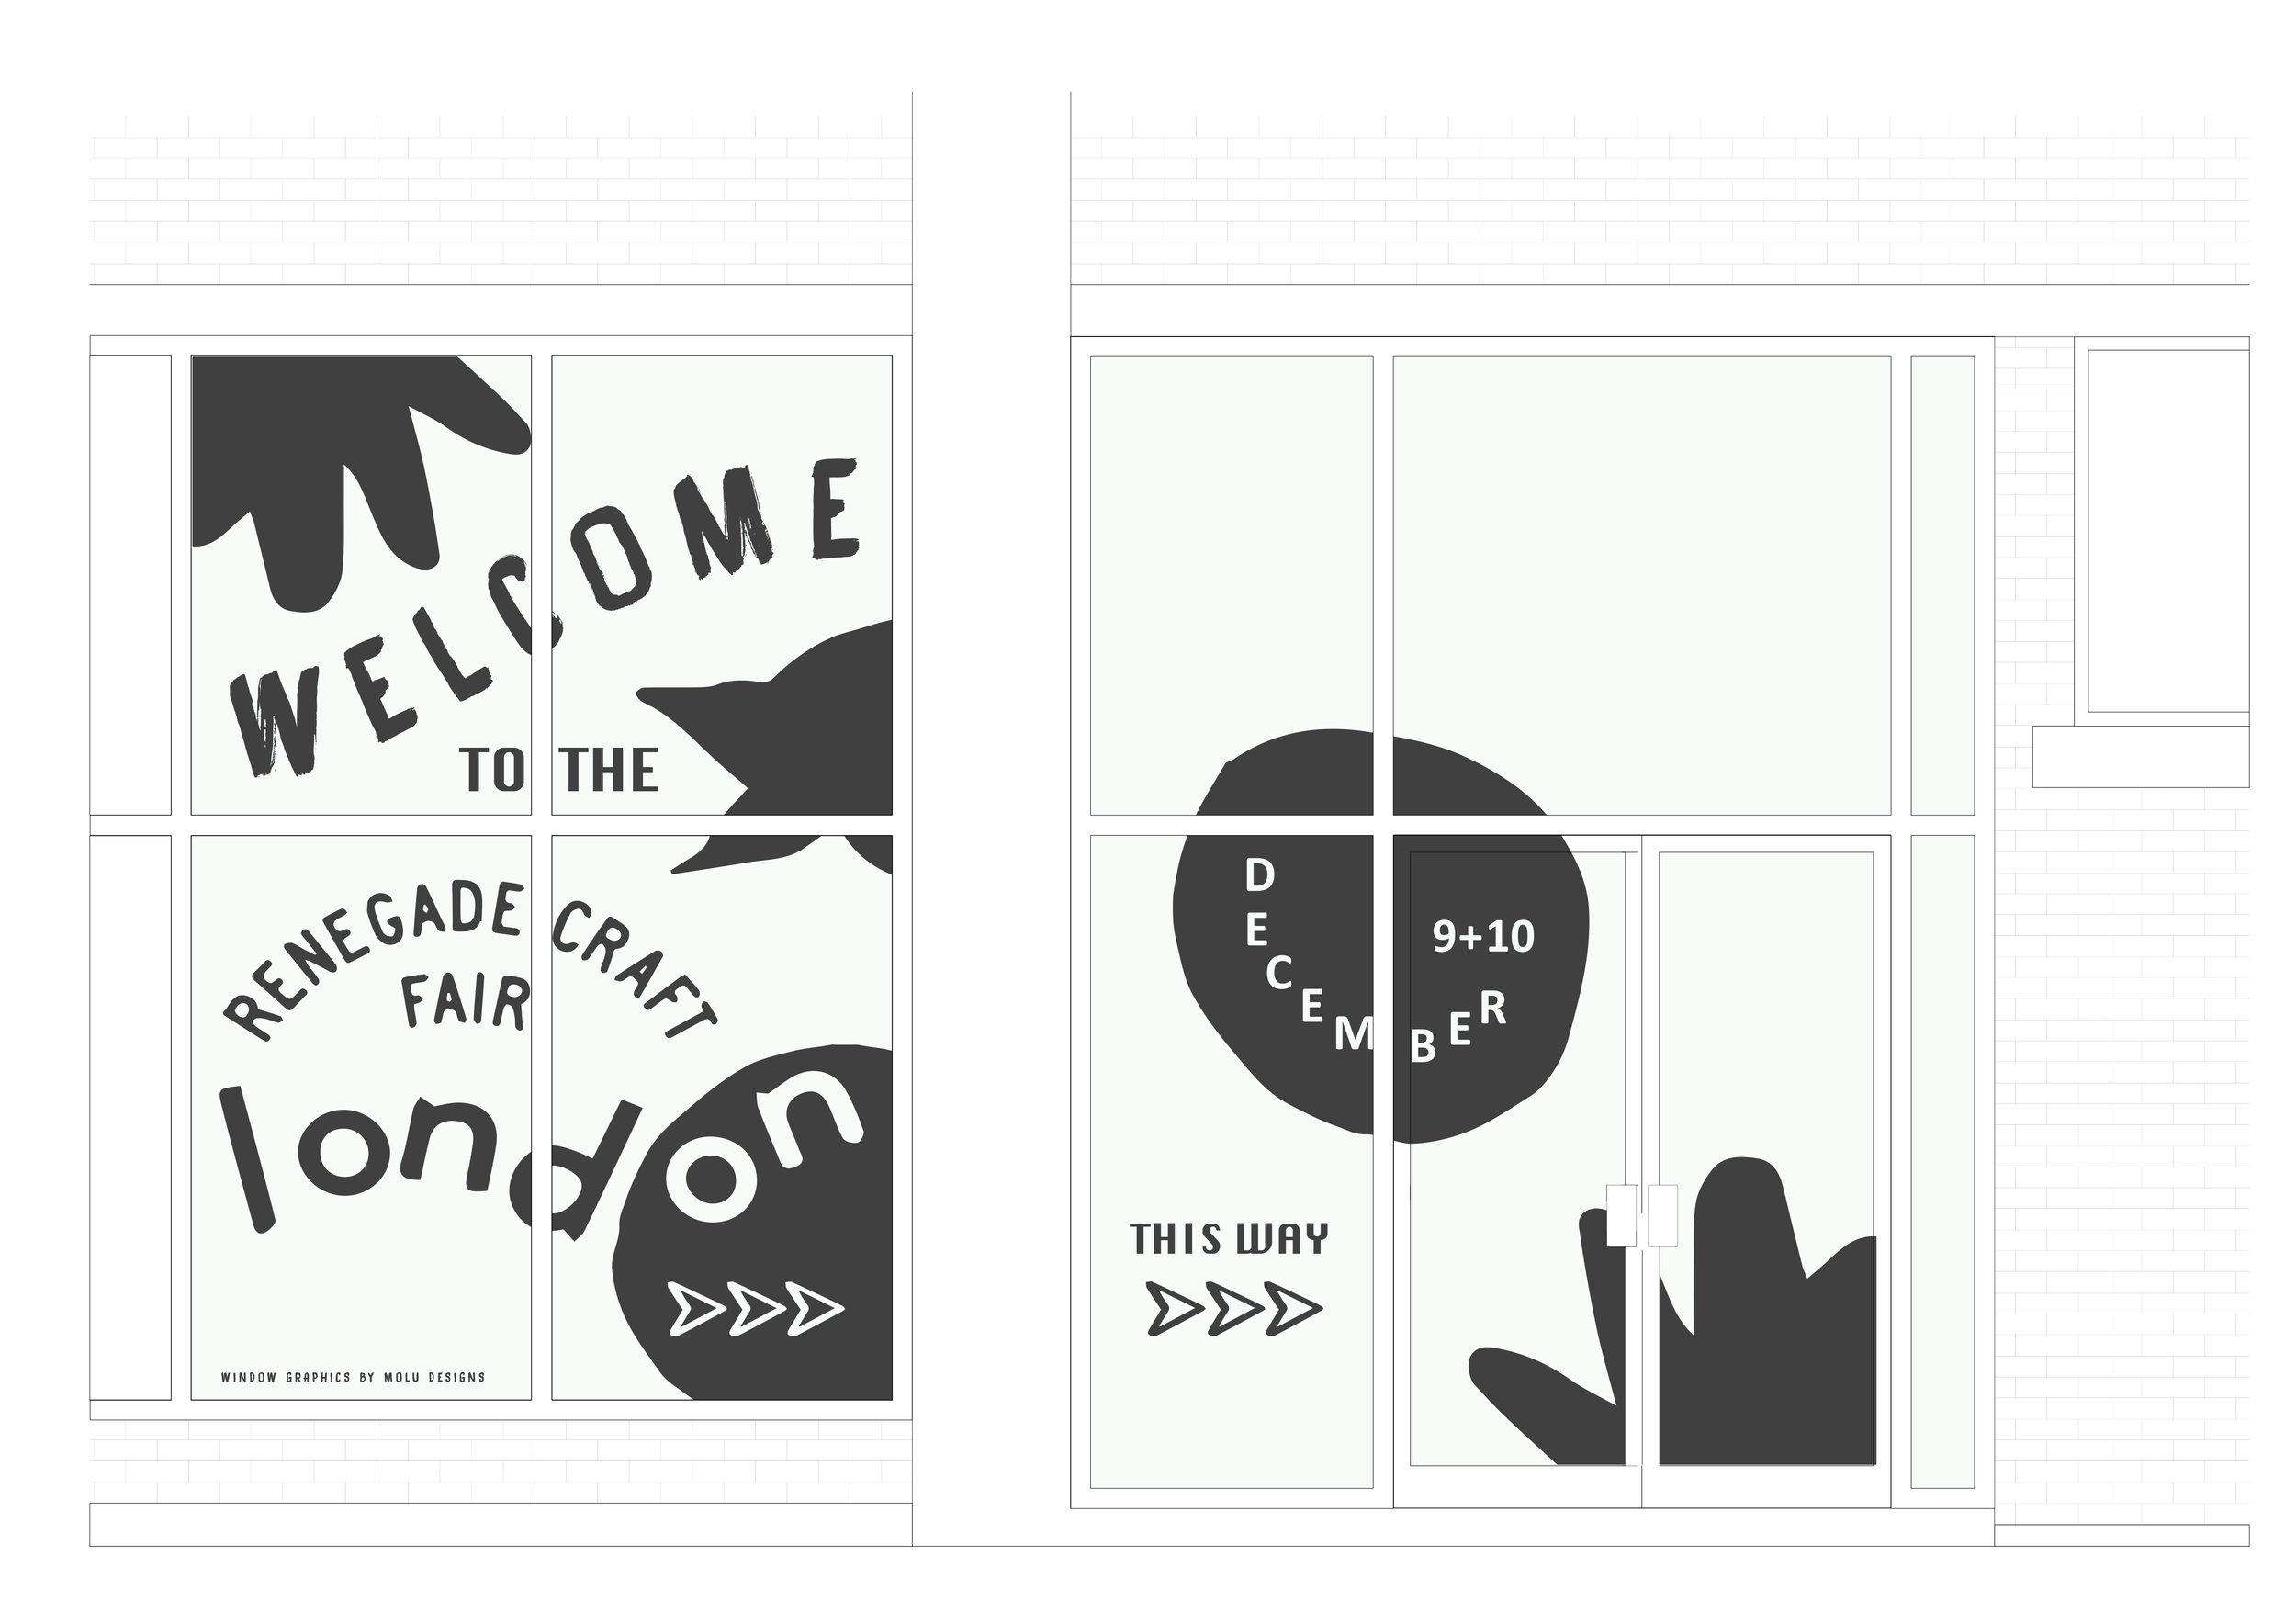 WINDOW GRAPHICS FOR RENEGADE CRAFT FAIR, LONDON -